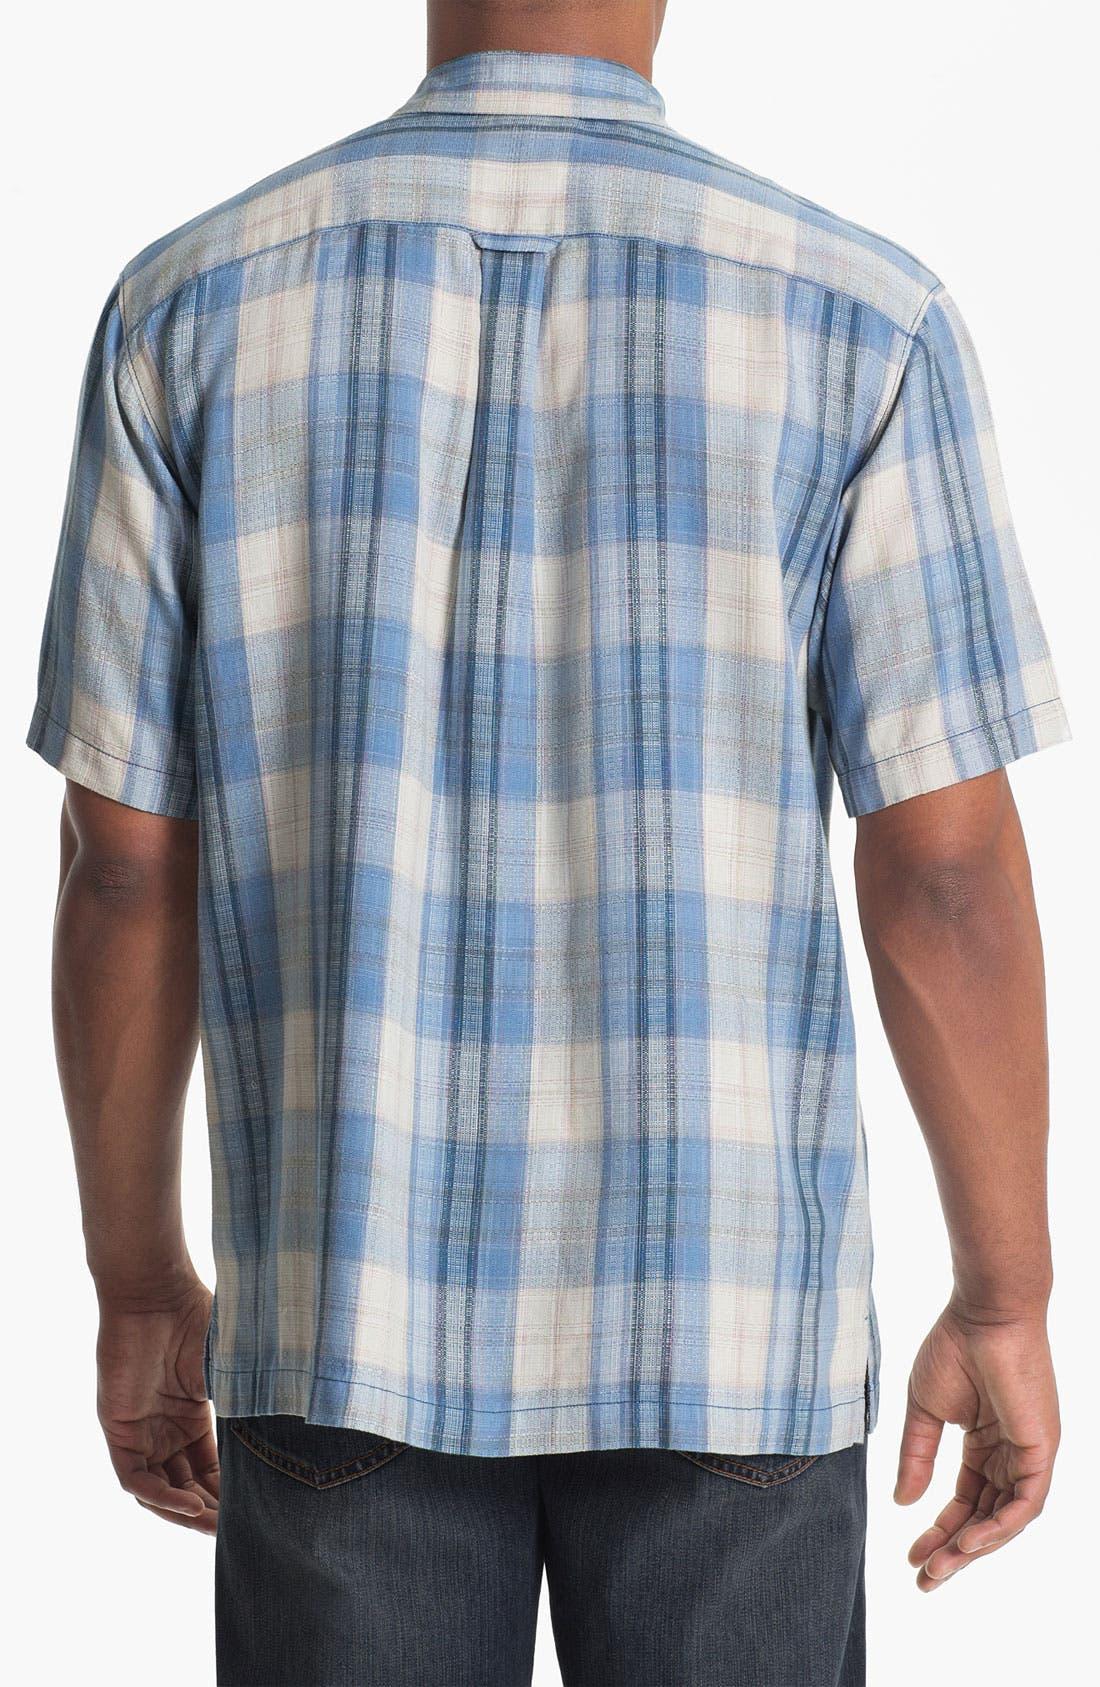 Alternate Image 2  - Tommy Bahama 'Seaside Plaid' Silk Campshirt (Big & Tall)